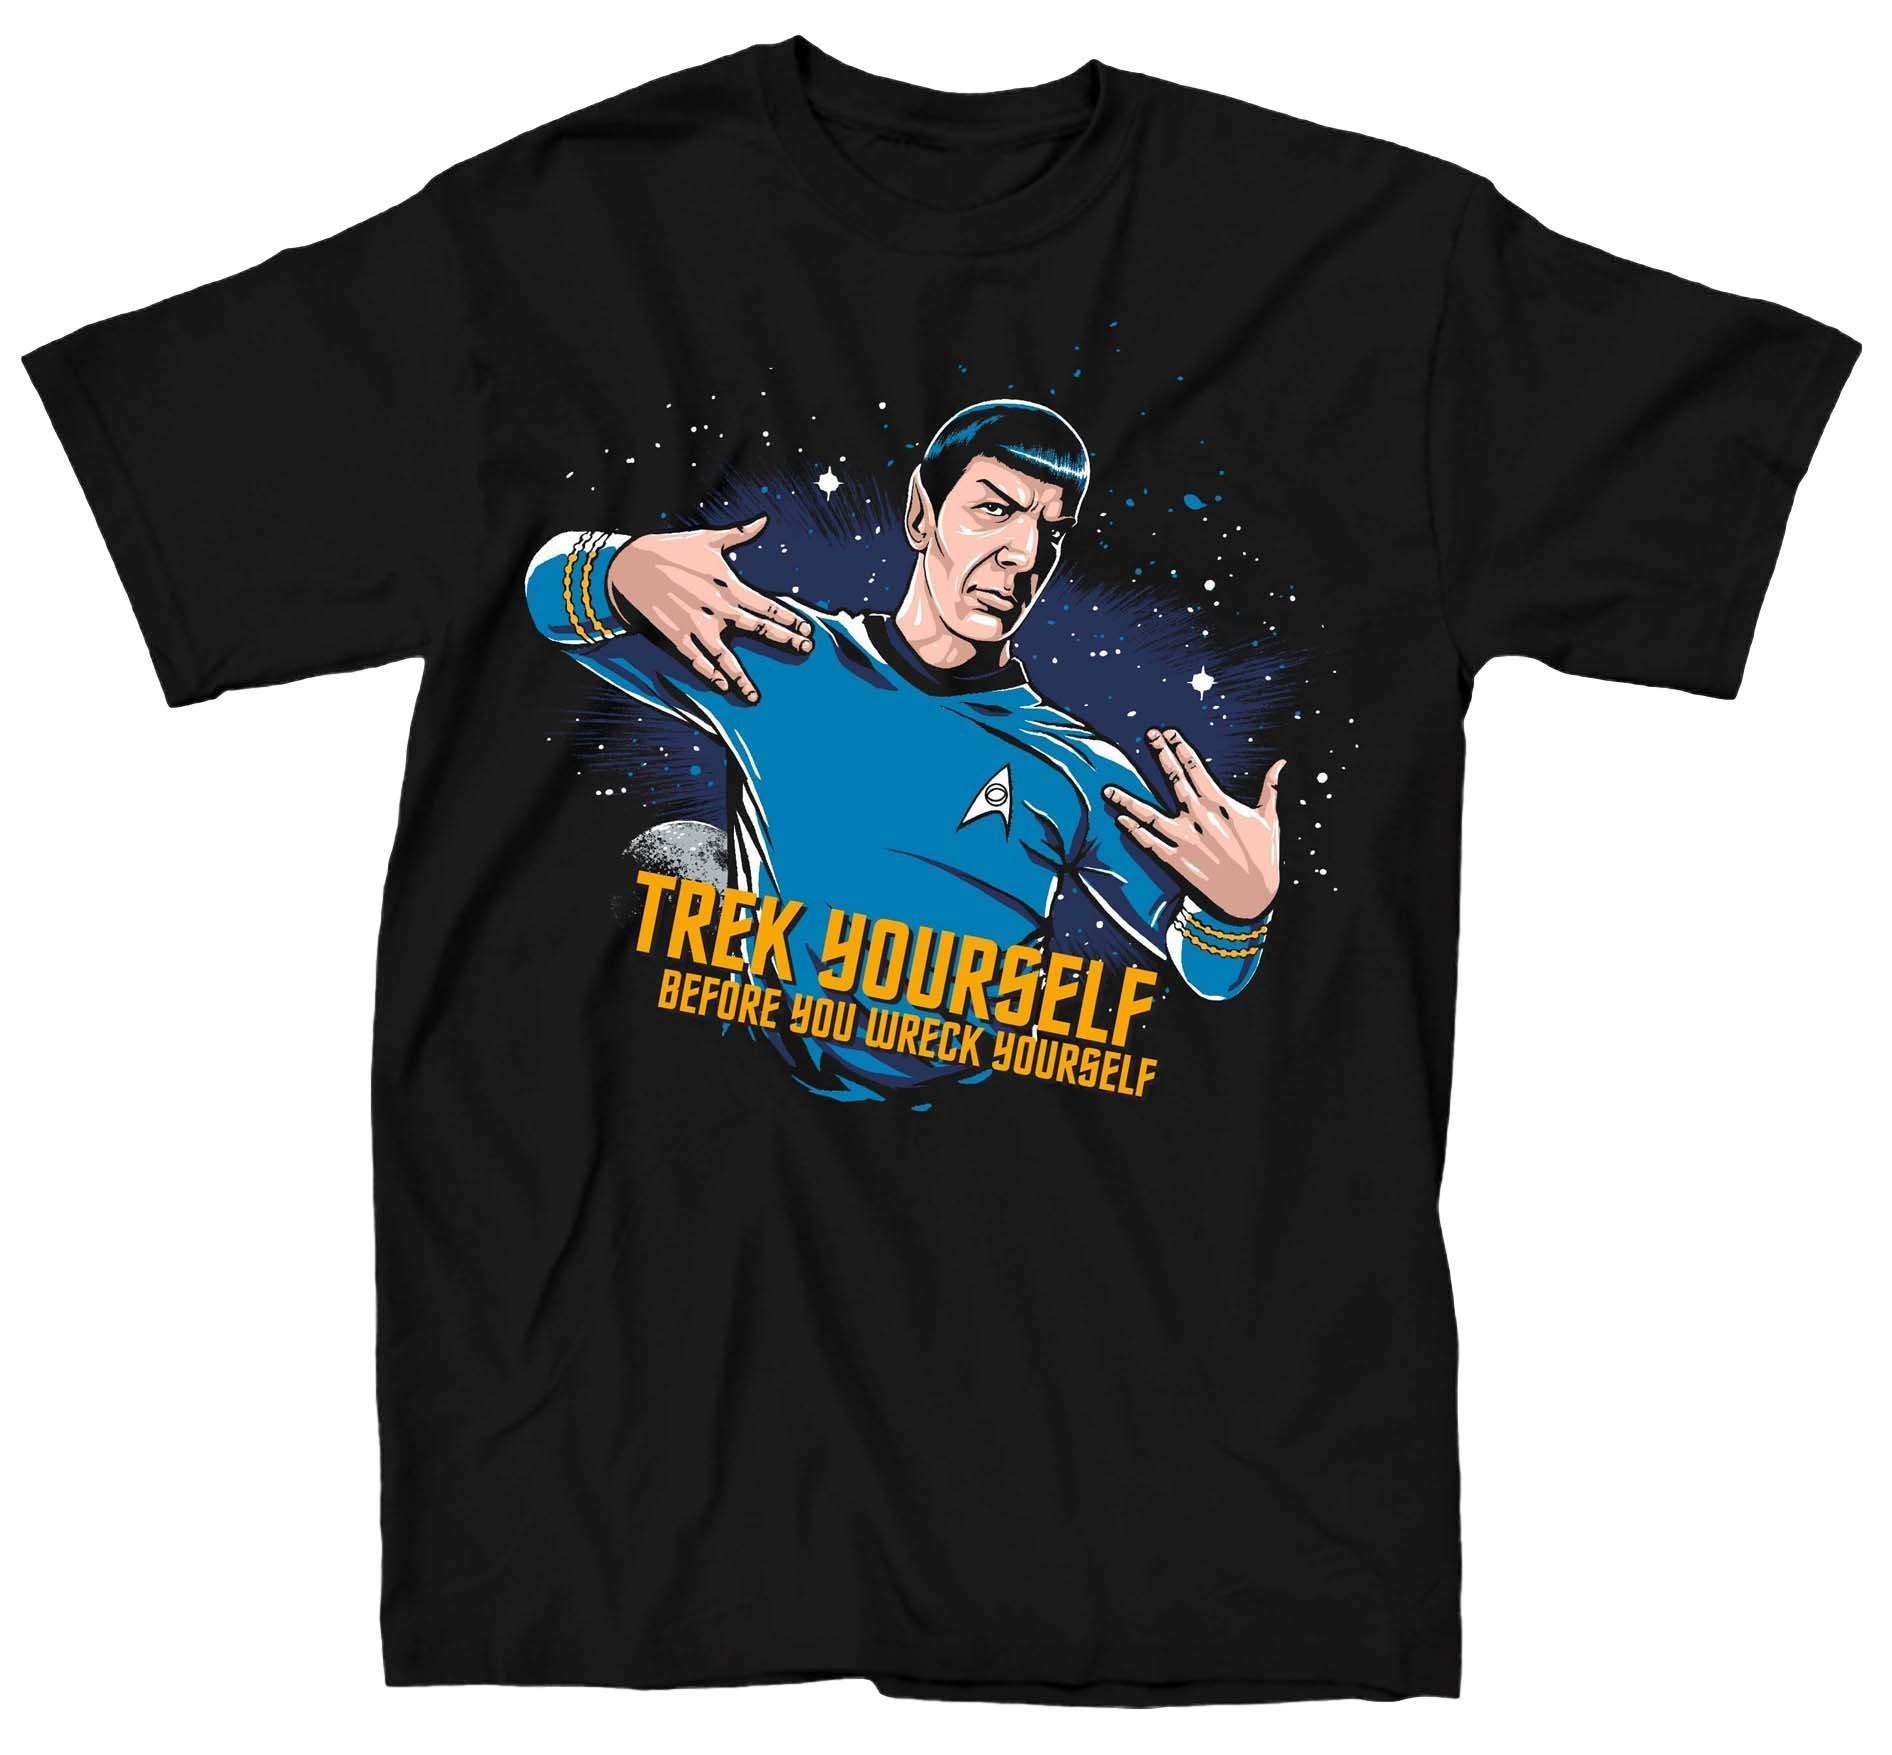 Star Trek Spock Trek Yourself Before Wreck Black Adult T-Shirt (Adult X-Large)